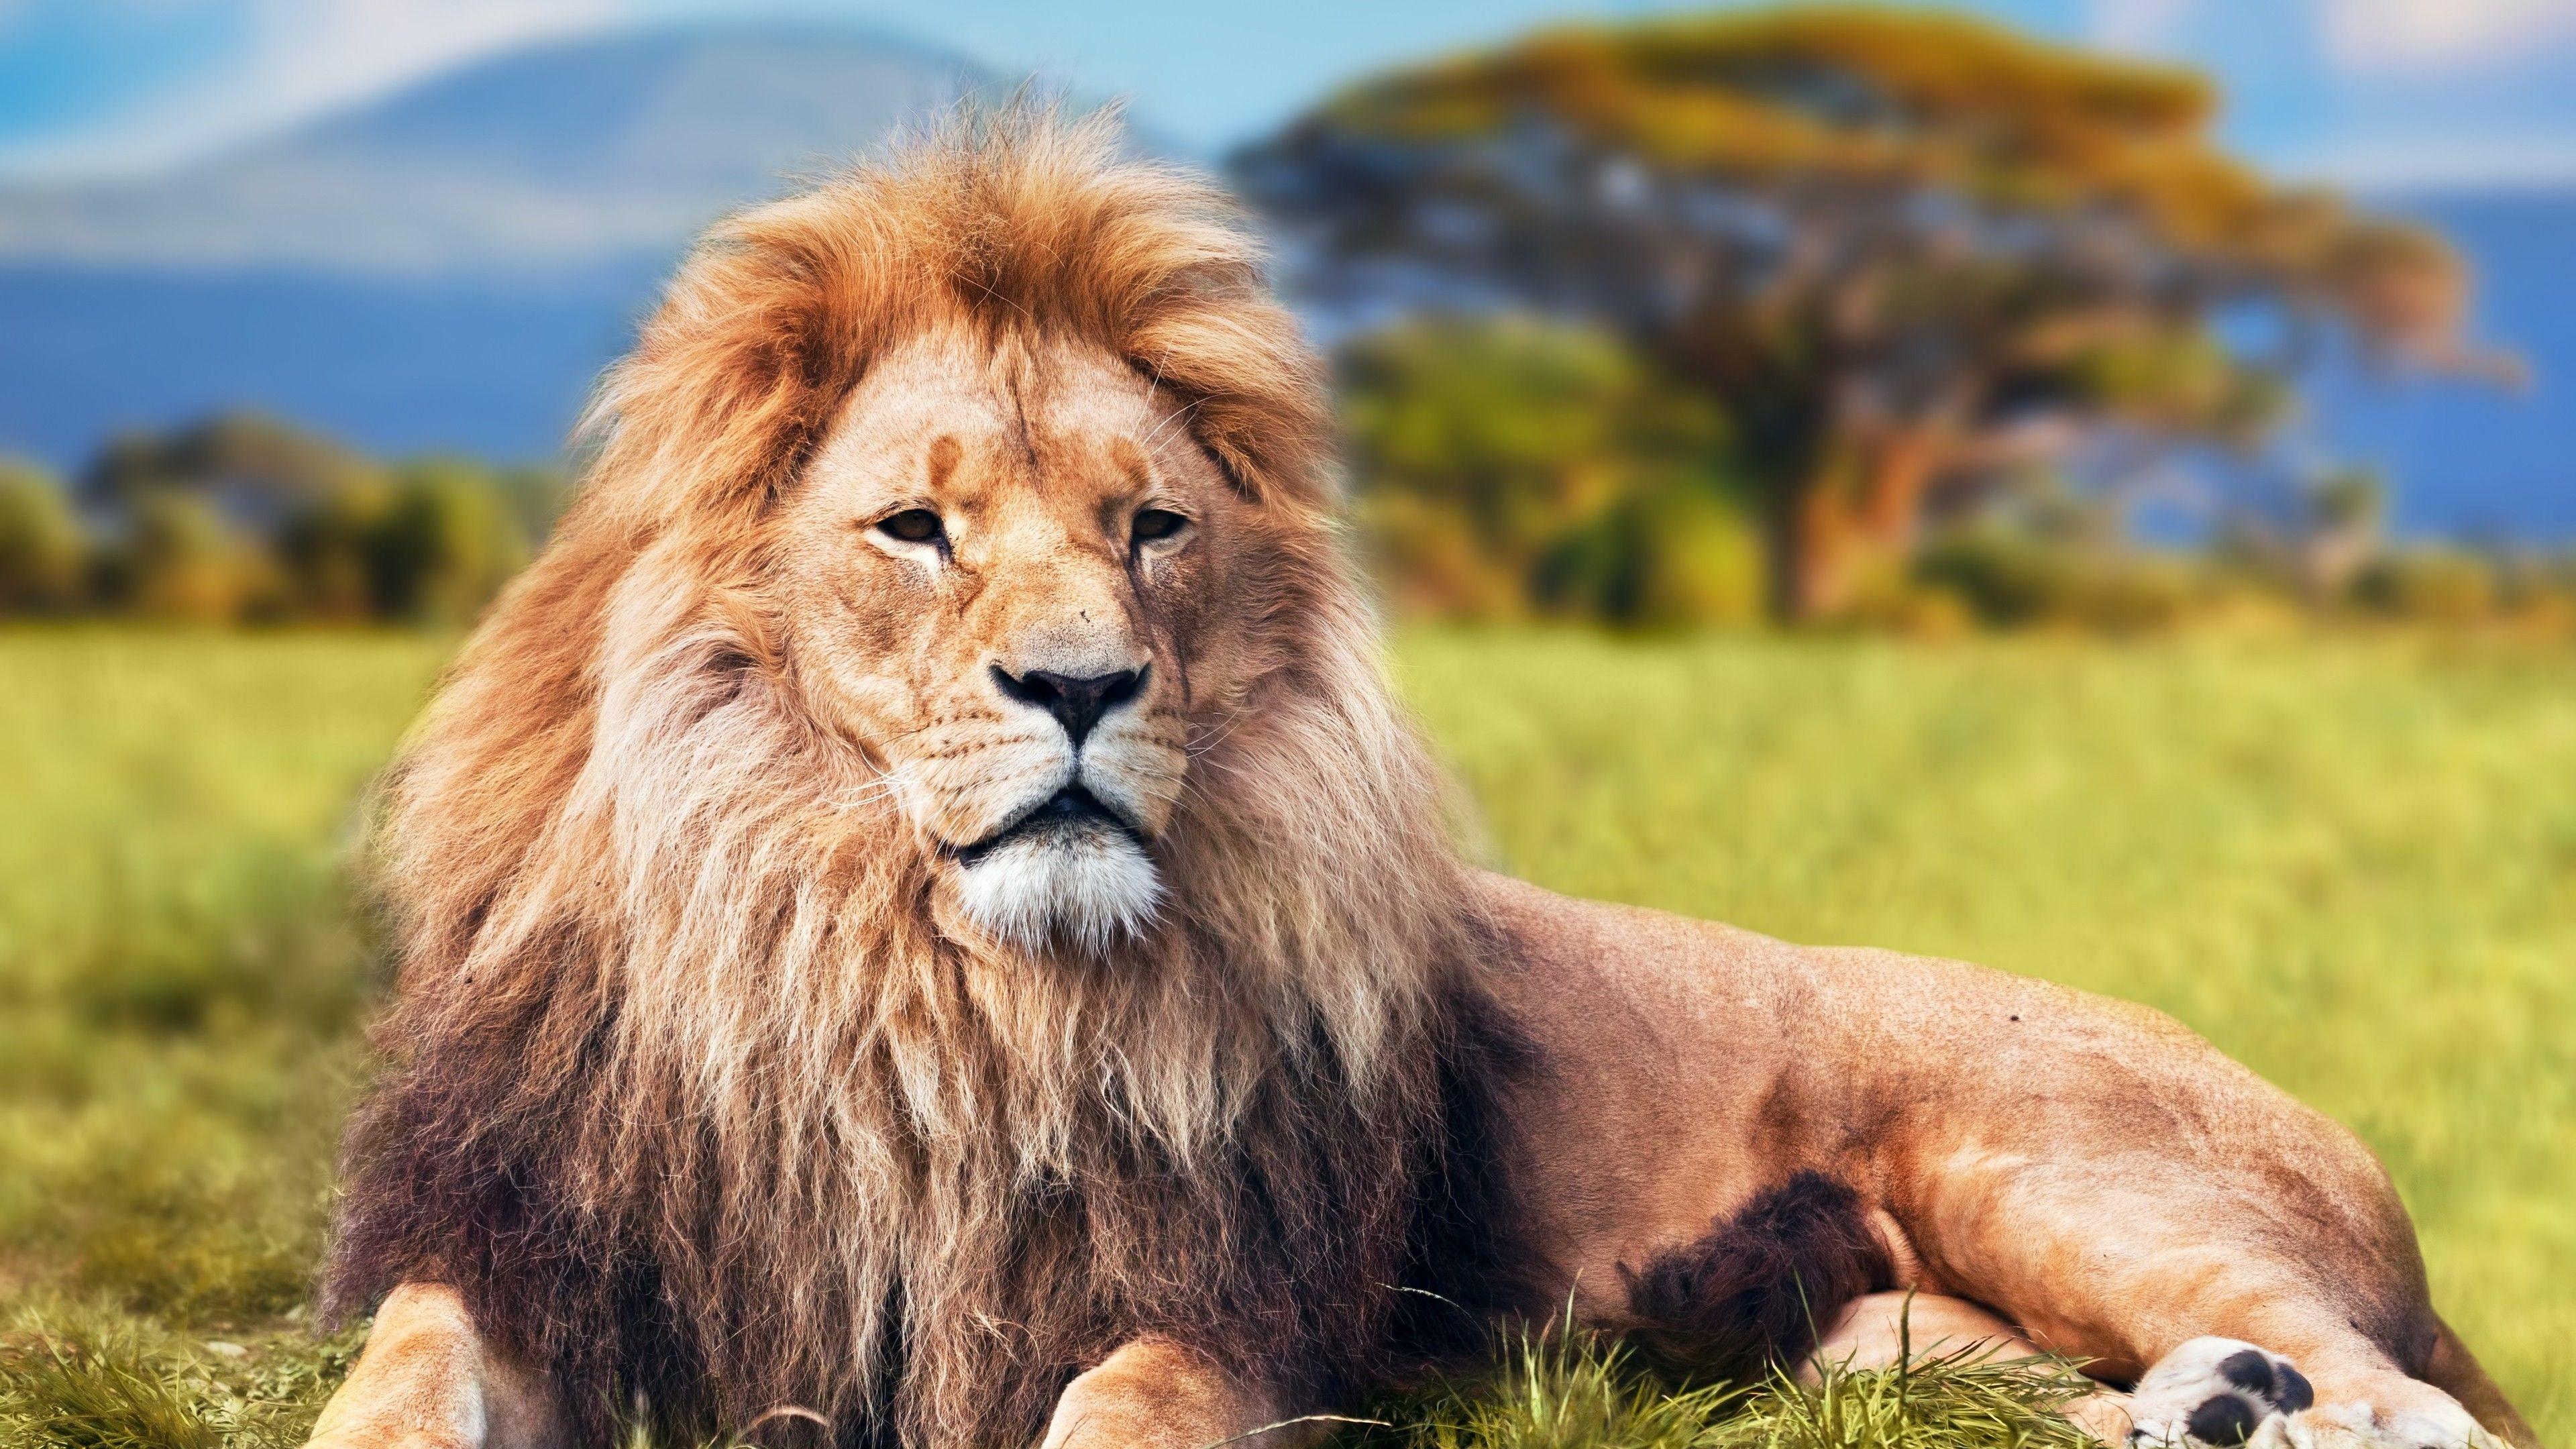 Lion 4k | Animals HD 4k Wallpapers